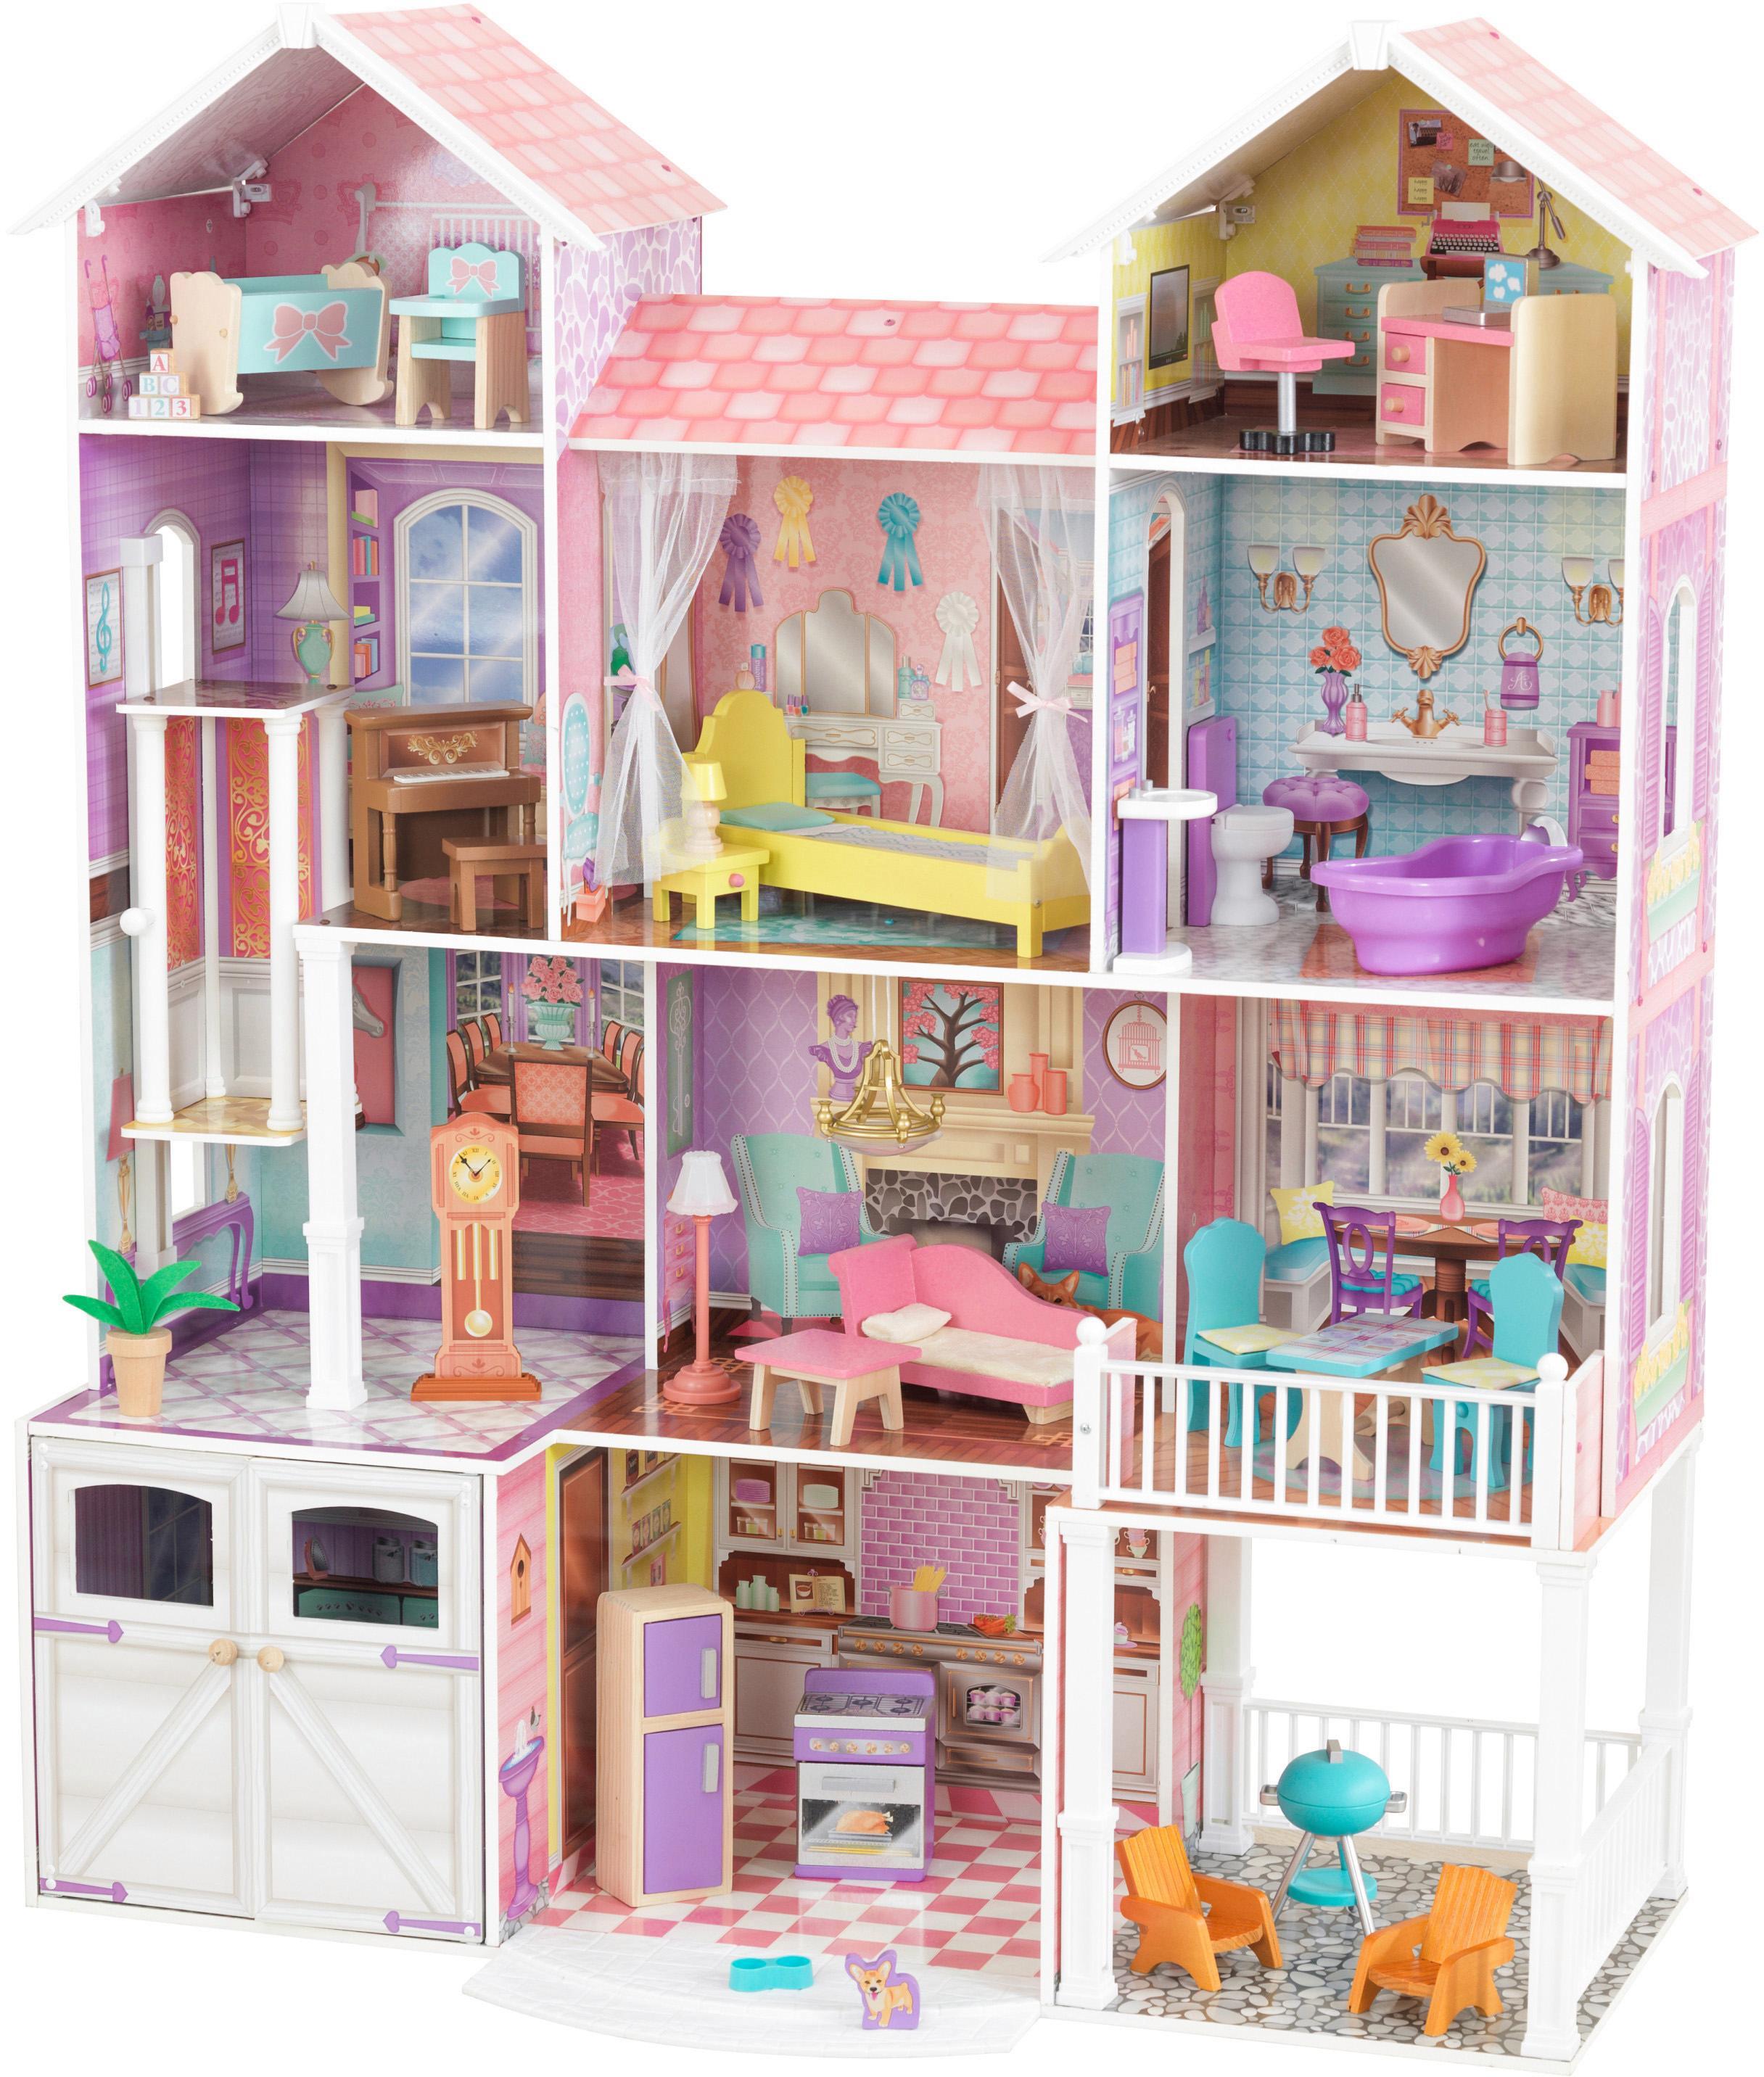 "KidKraft Puppenhaus ""Landgut"" Kindermode/Spielzeug/Puppen/Puppenhaus"